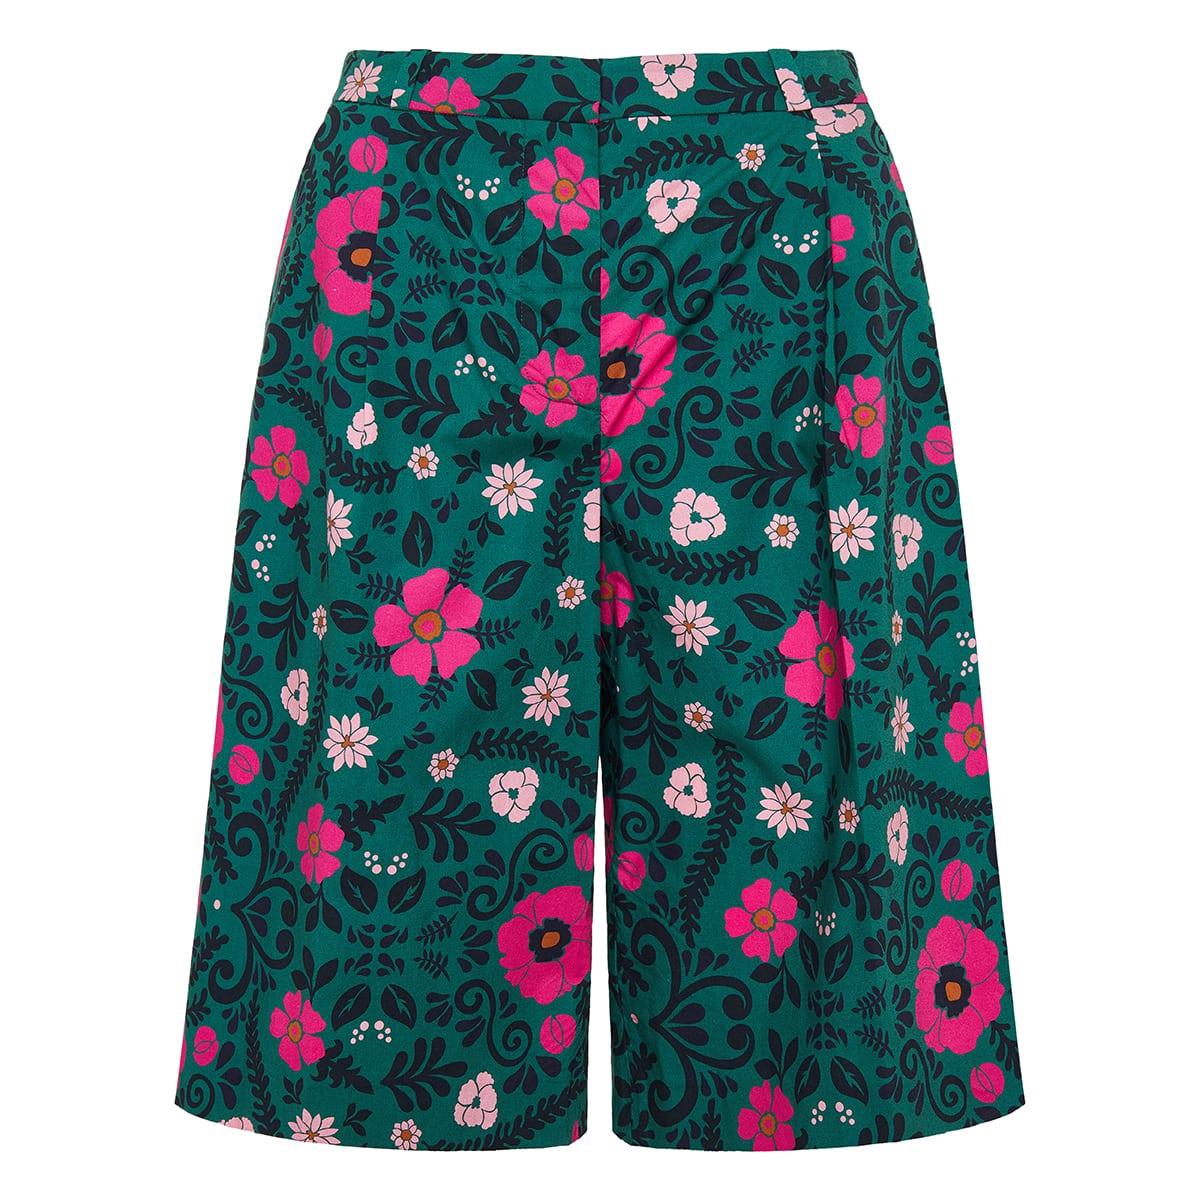 Bermuda floral poplin shorts